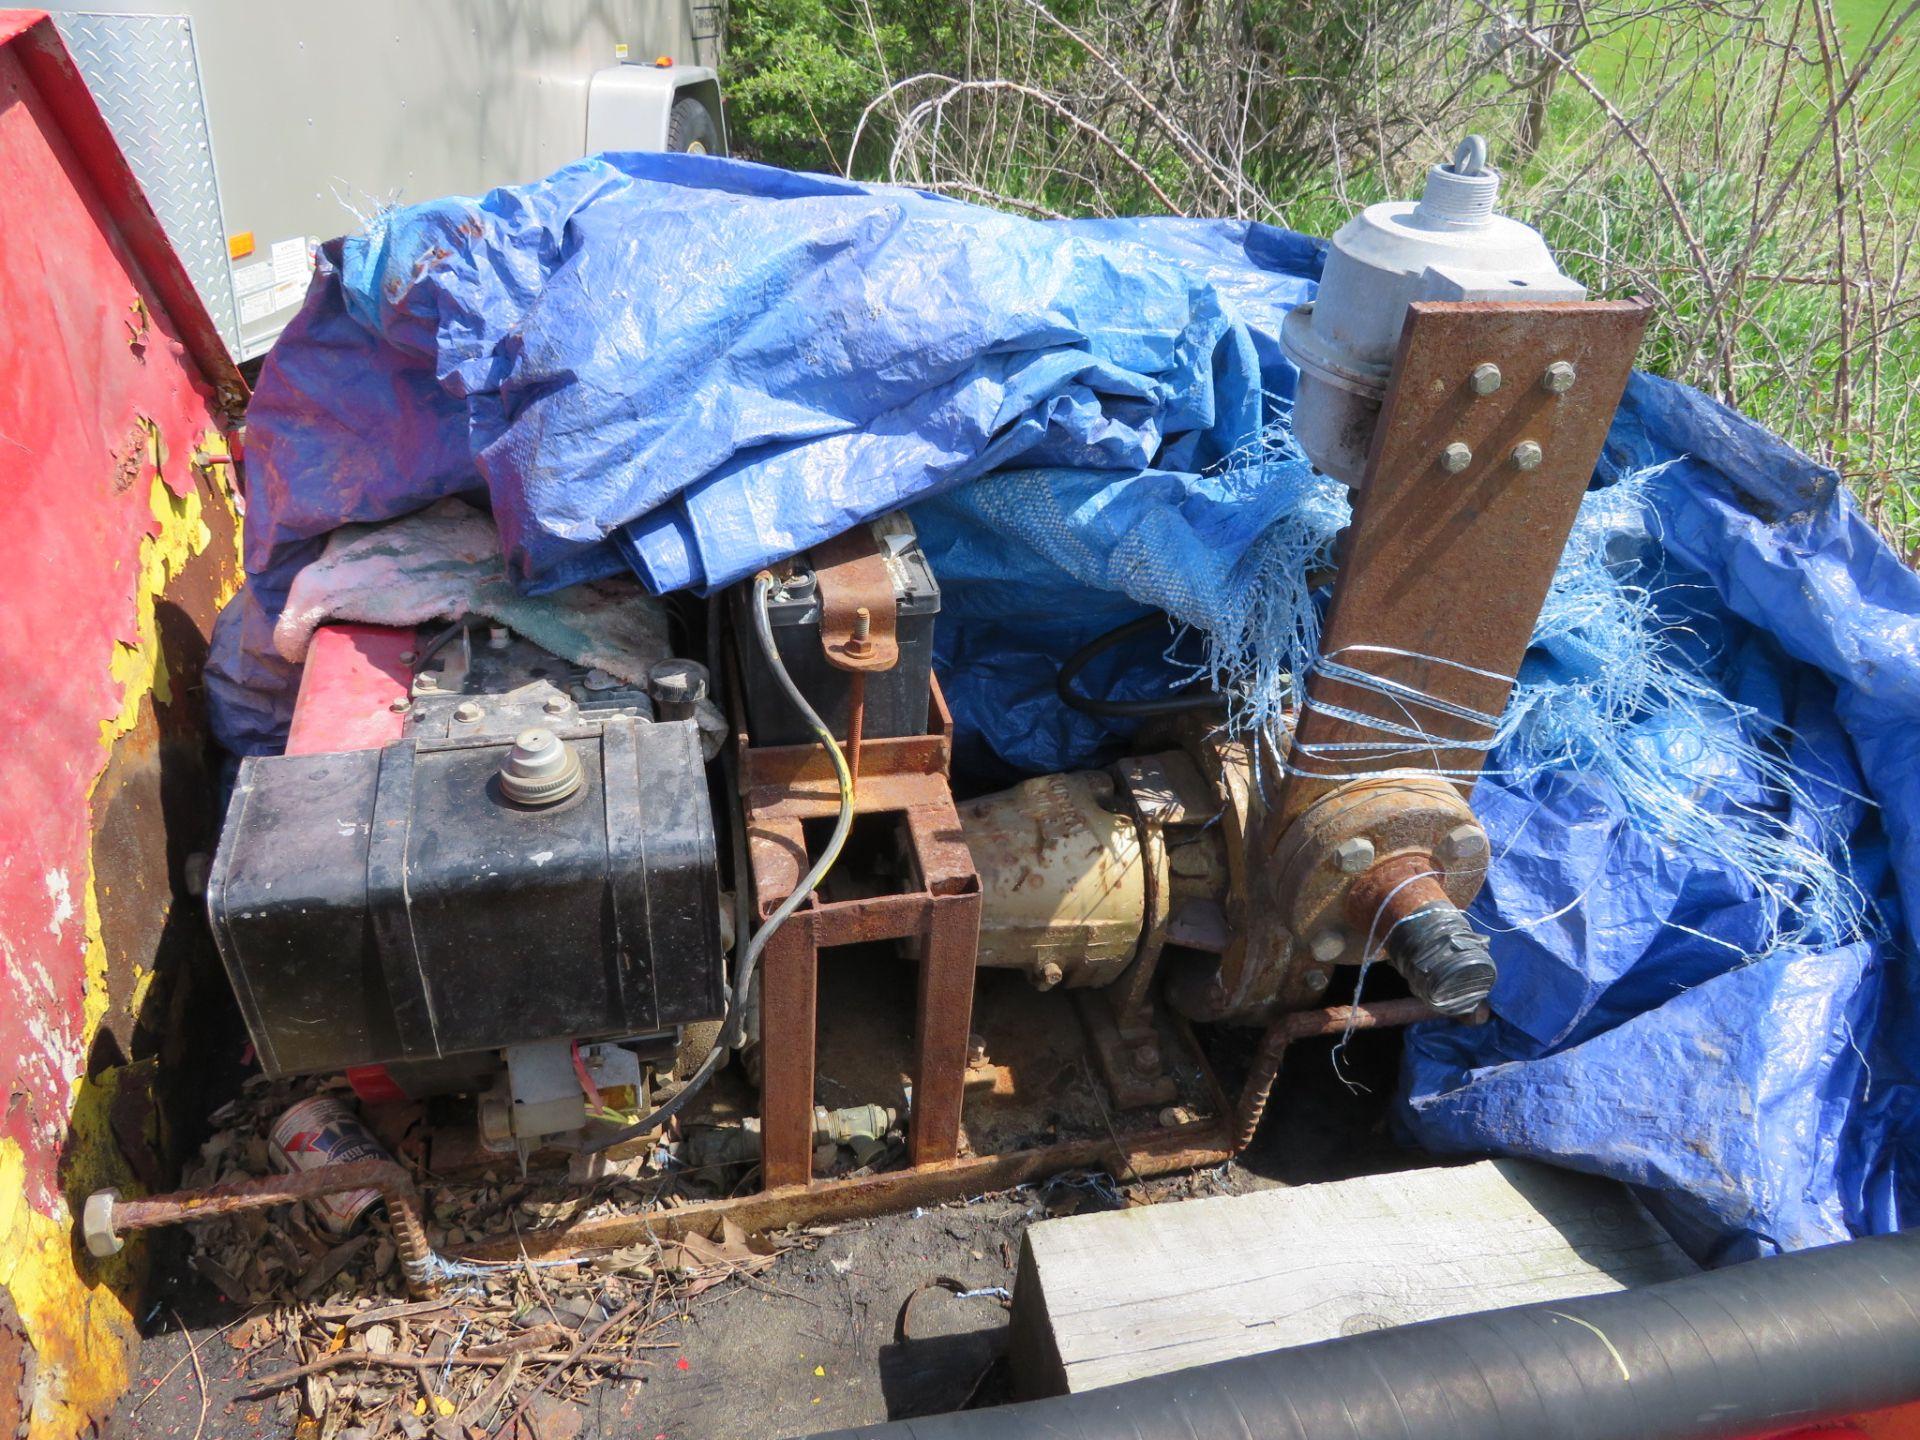 Lot 14 - Single Axle 5 1/2' Steel Trailer w/ Air Compressor Gas Powered & Alum. Tool Box w/ Aurora Gas